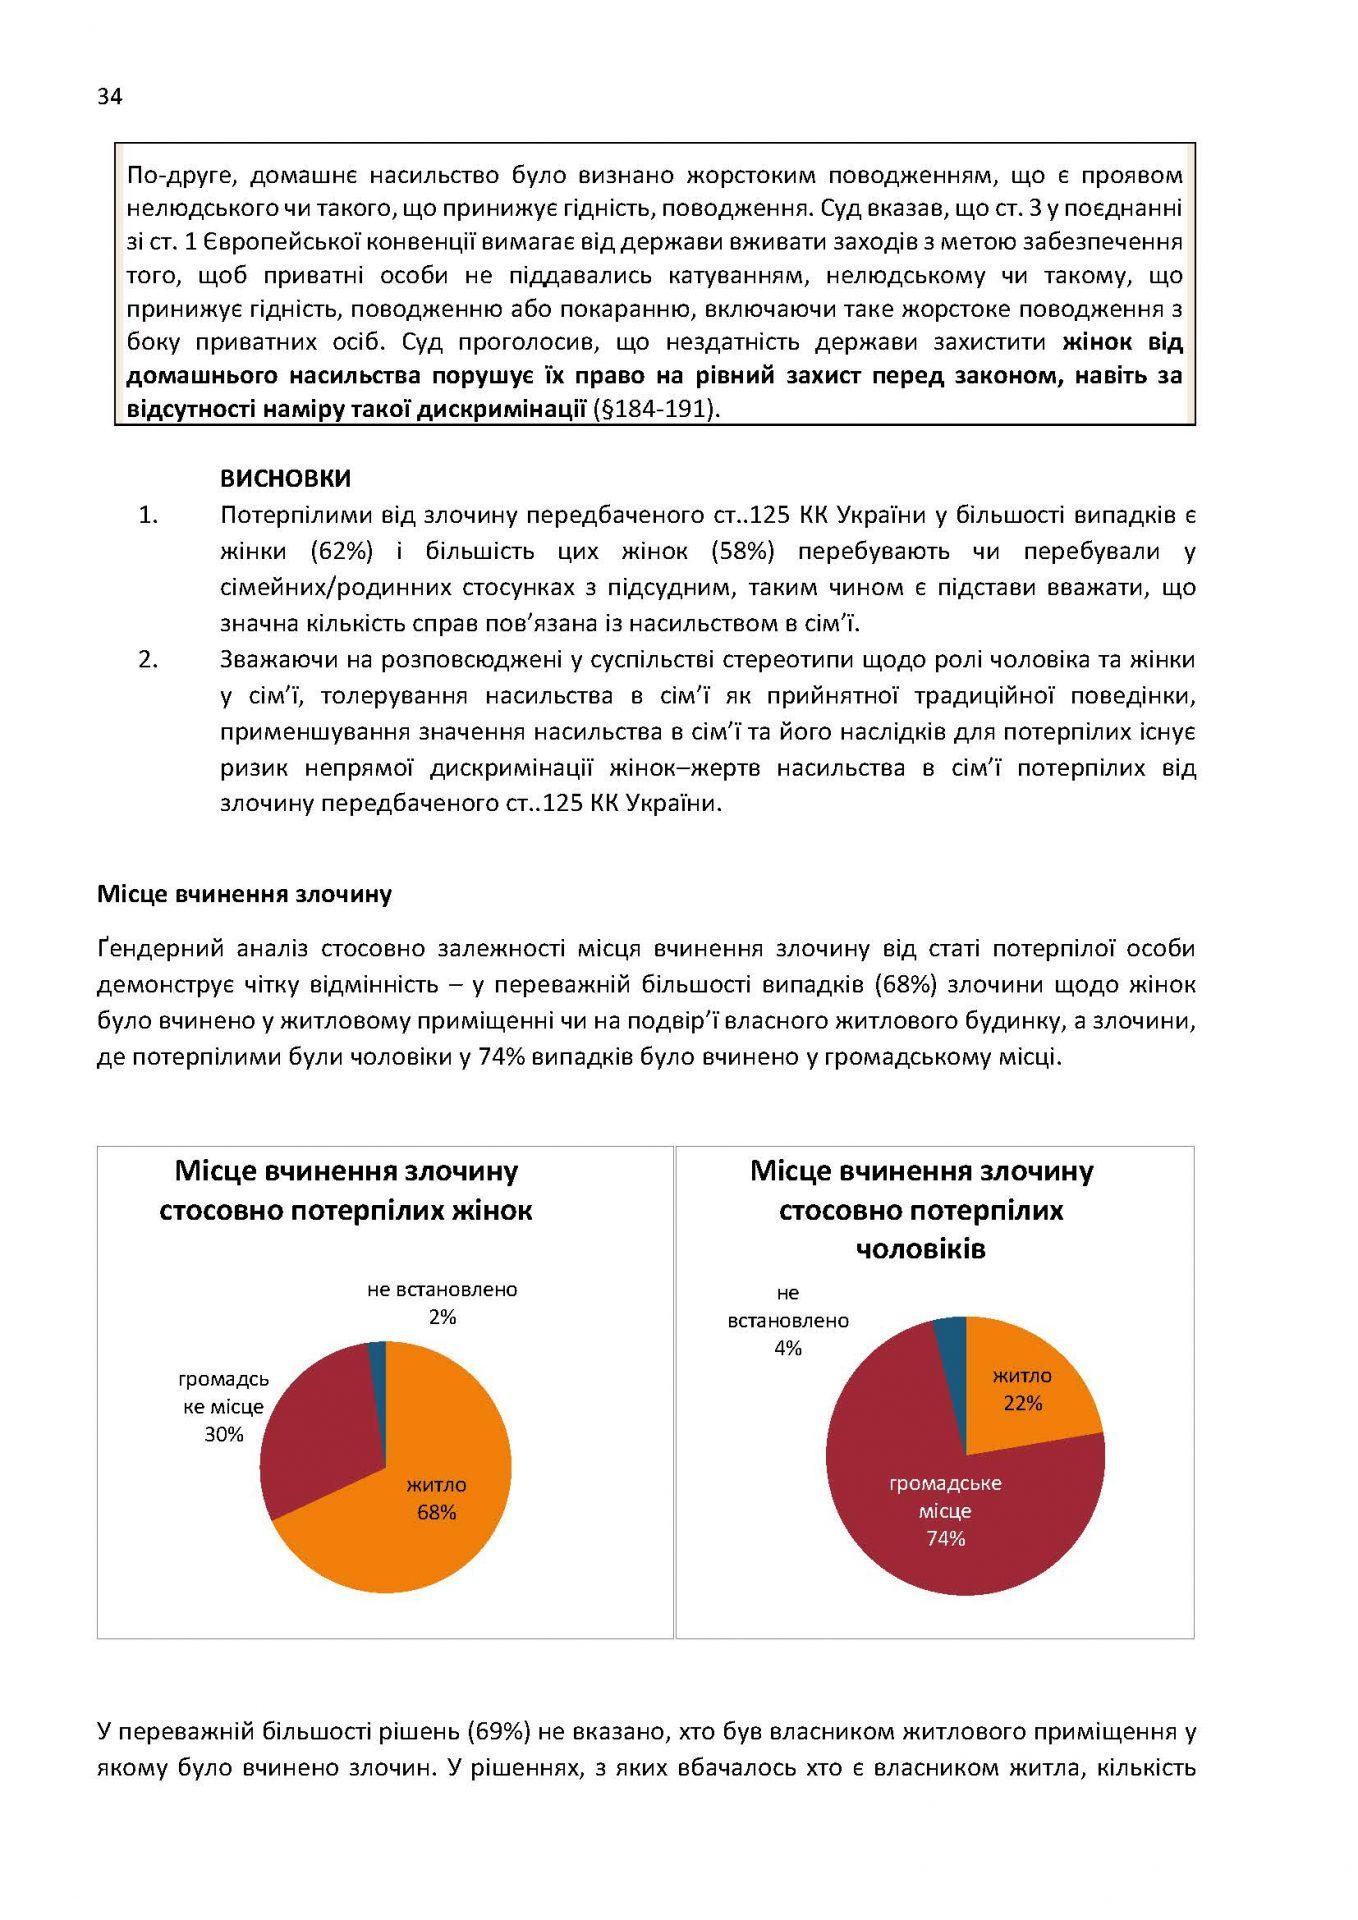 Draft Report monitoring print USAID_Страница_34